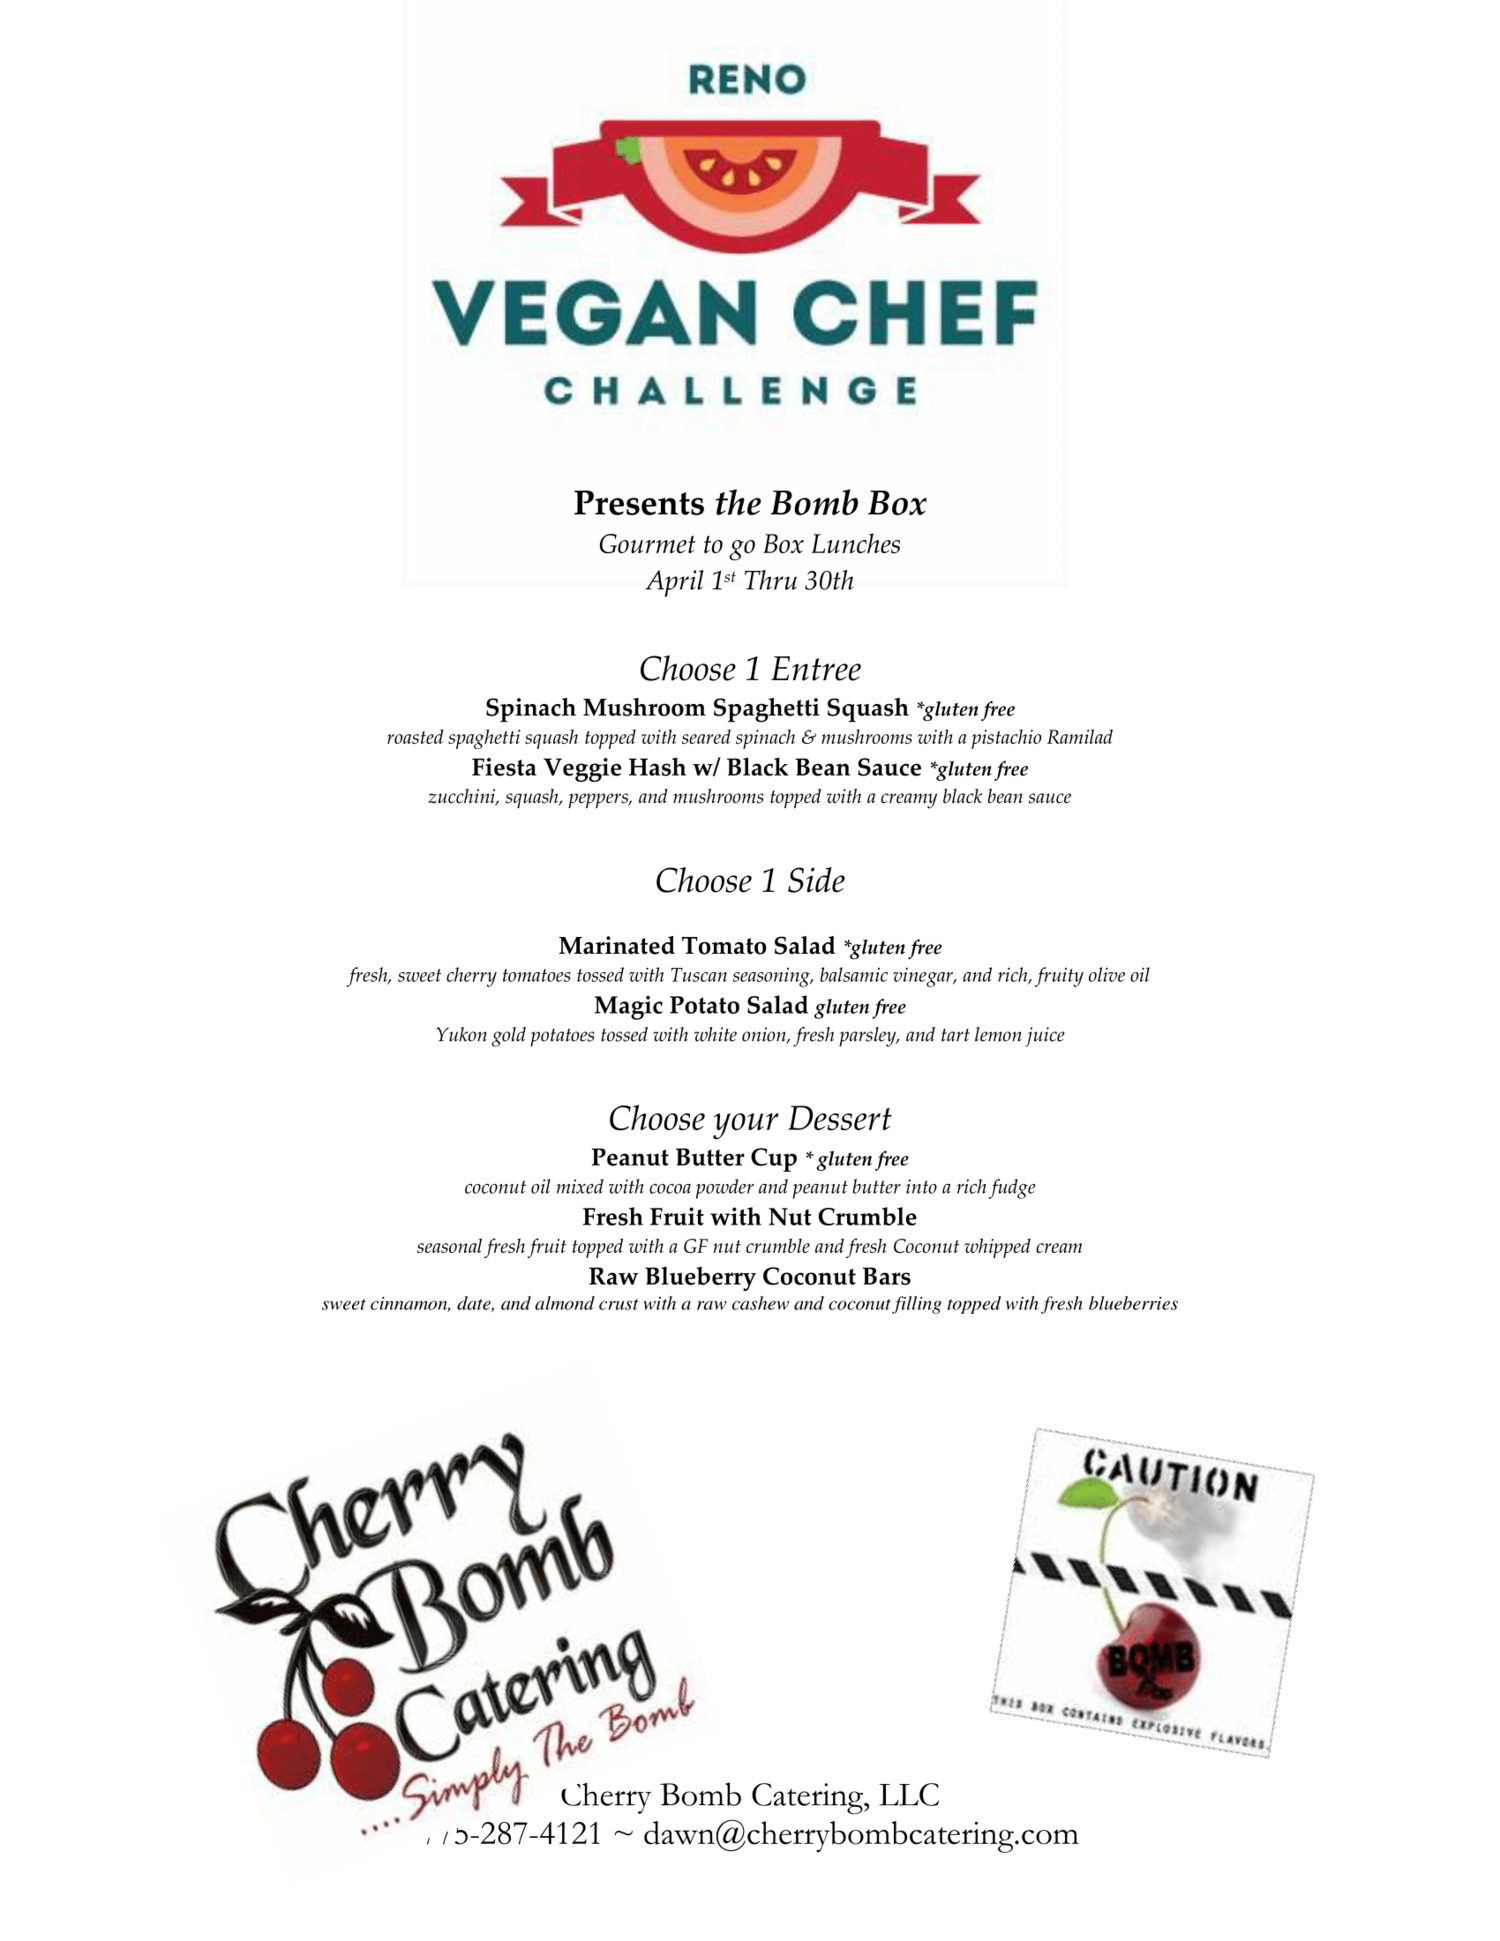 Cherry Bomb Catering — Reno Vegan Chef Challenge